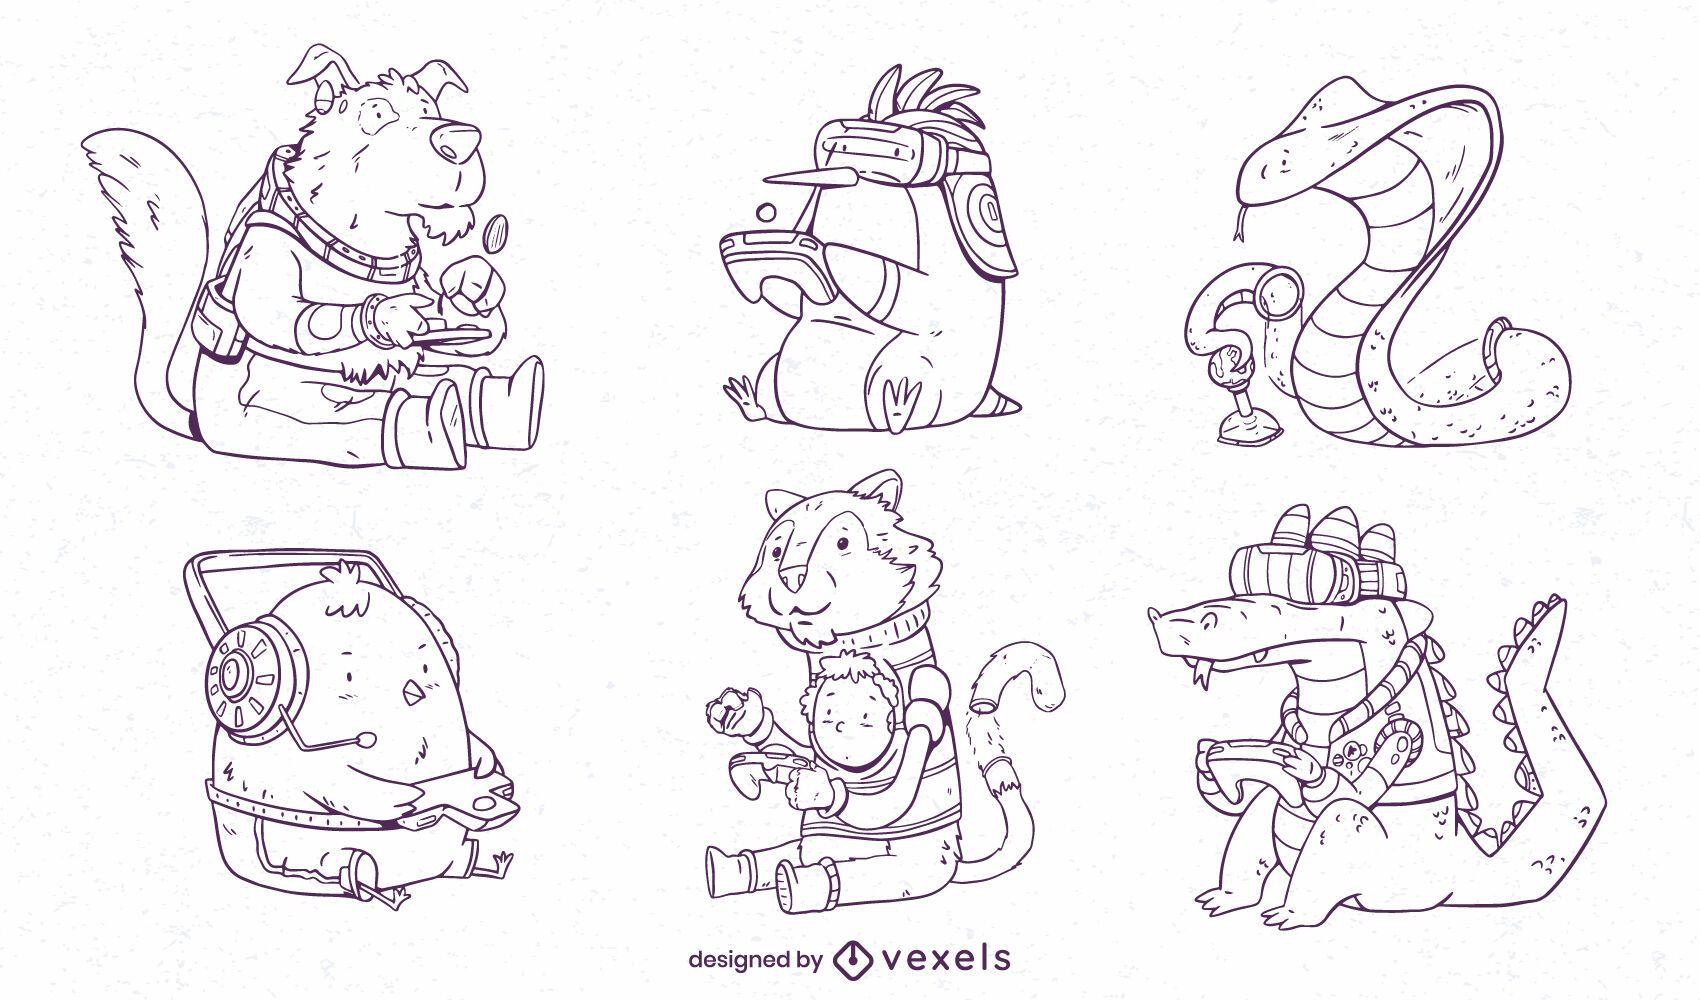 Set of cool hand drawn gaming animals